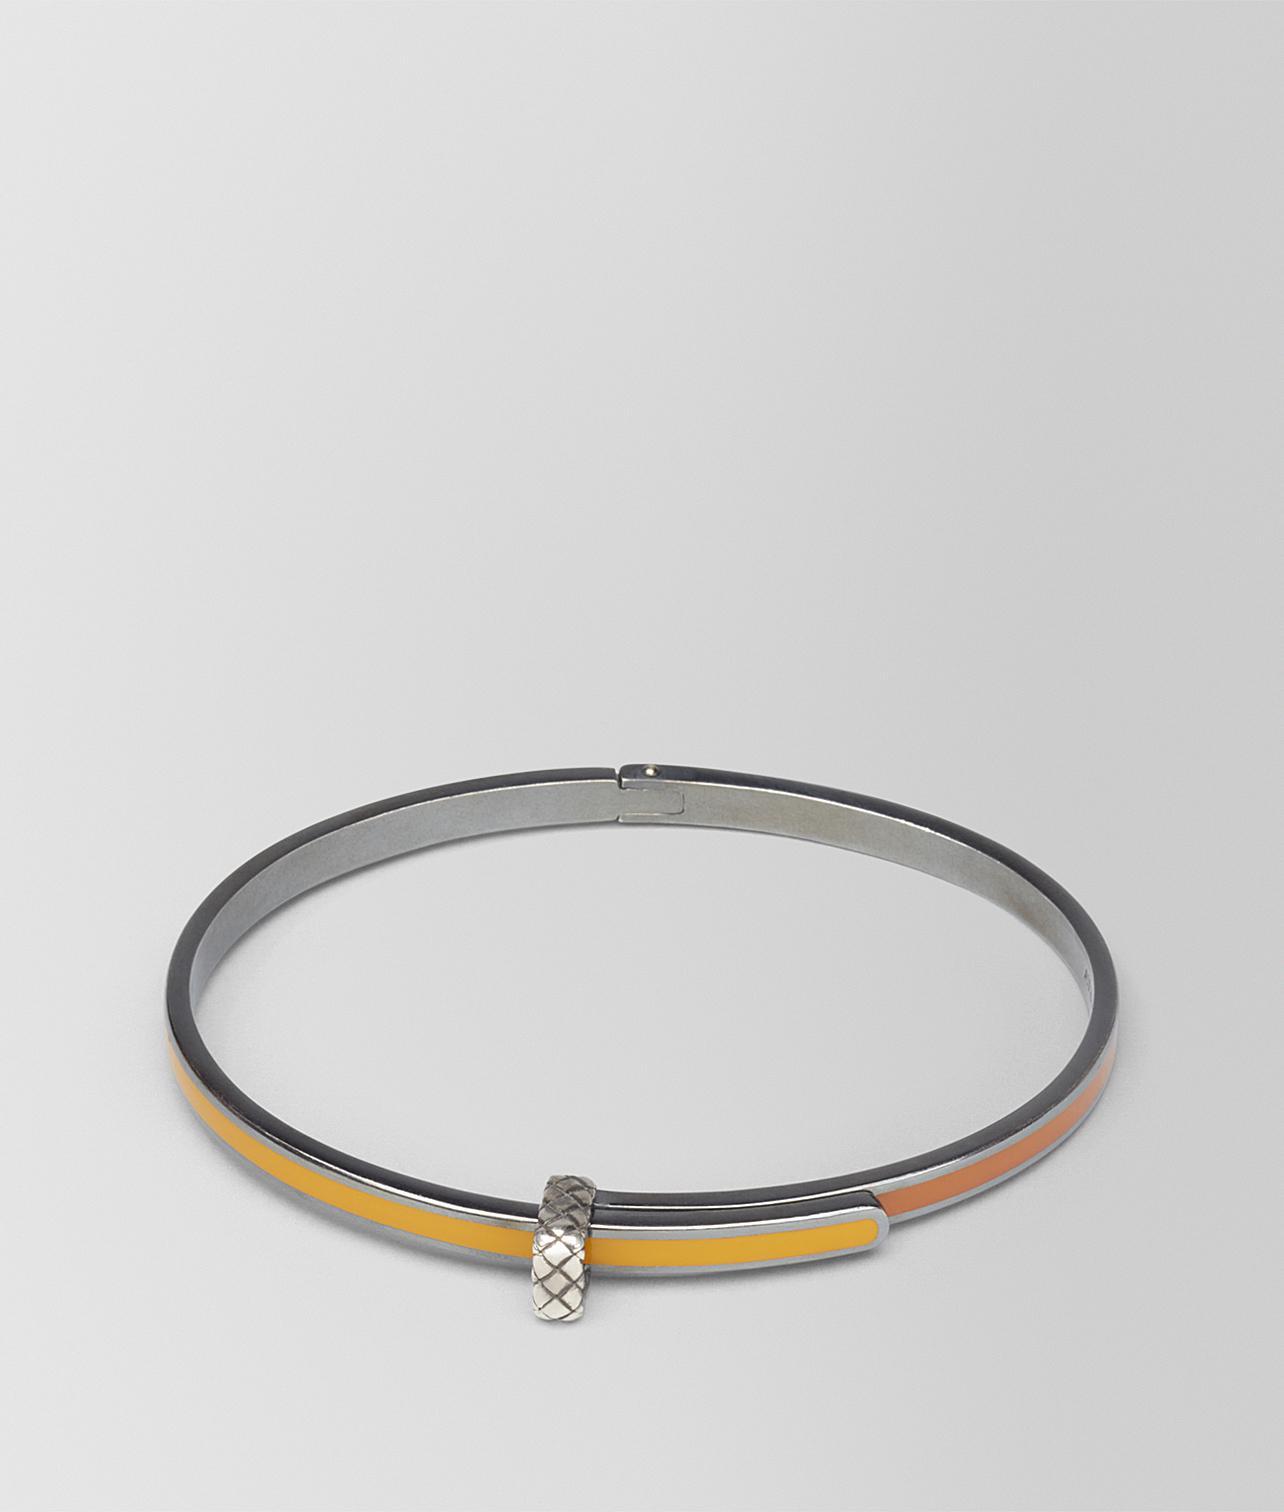 gold and silver antique Intrecciato bangle - Metallic Bottega Veneta HJpnfJVv89